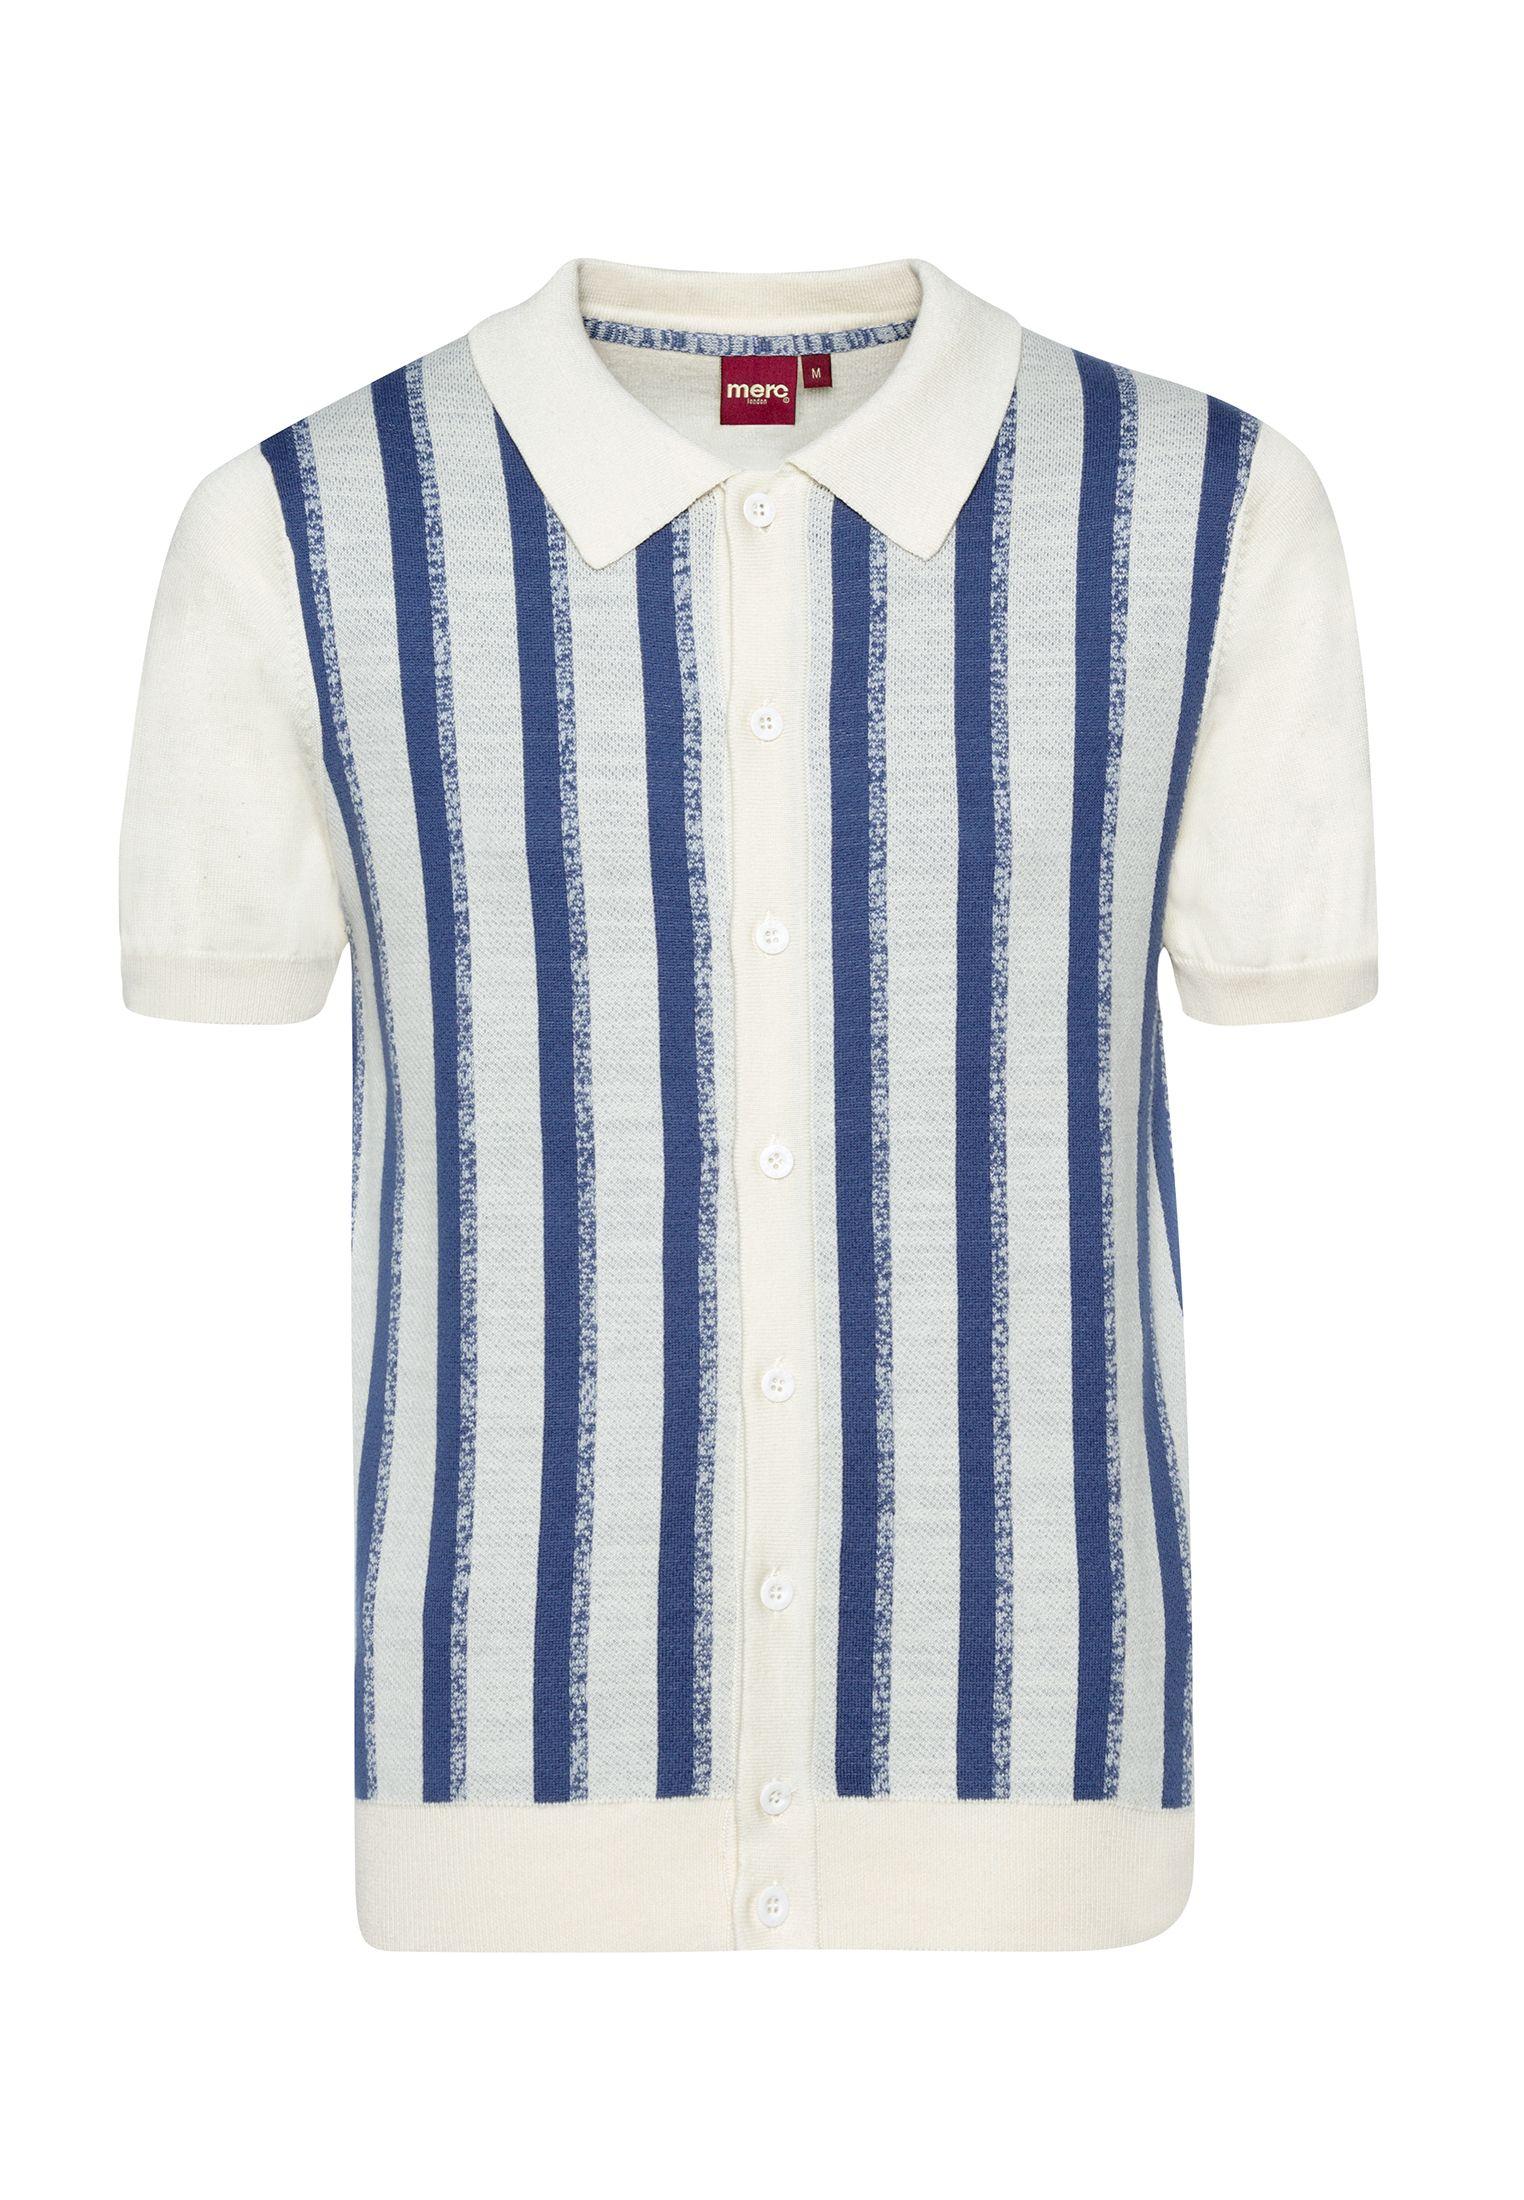 Wilmot Vertical Stripes Knit Polo In Cream